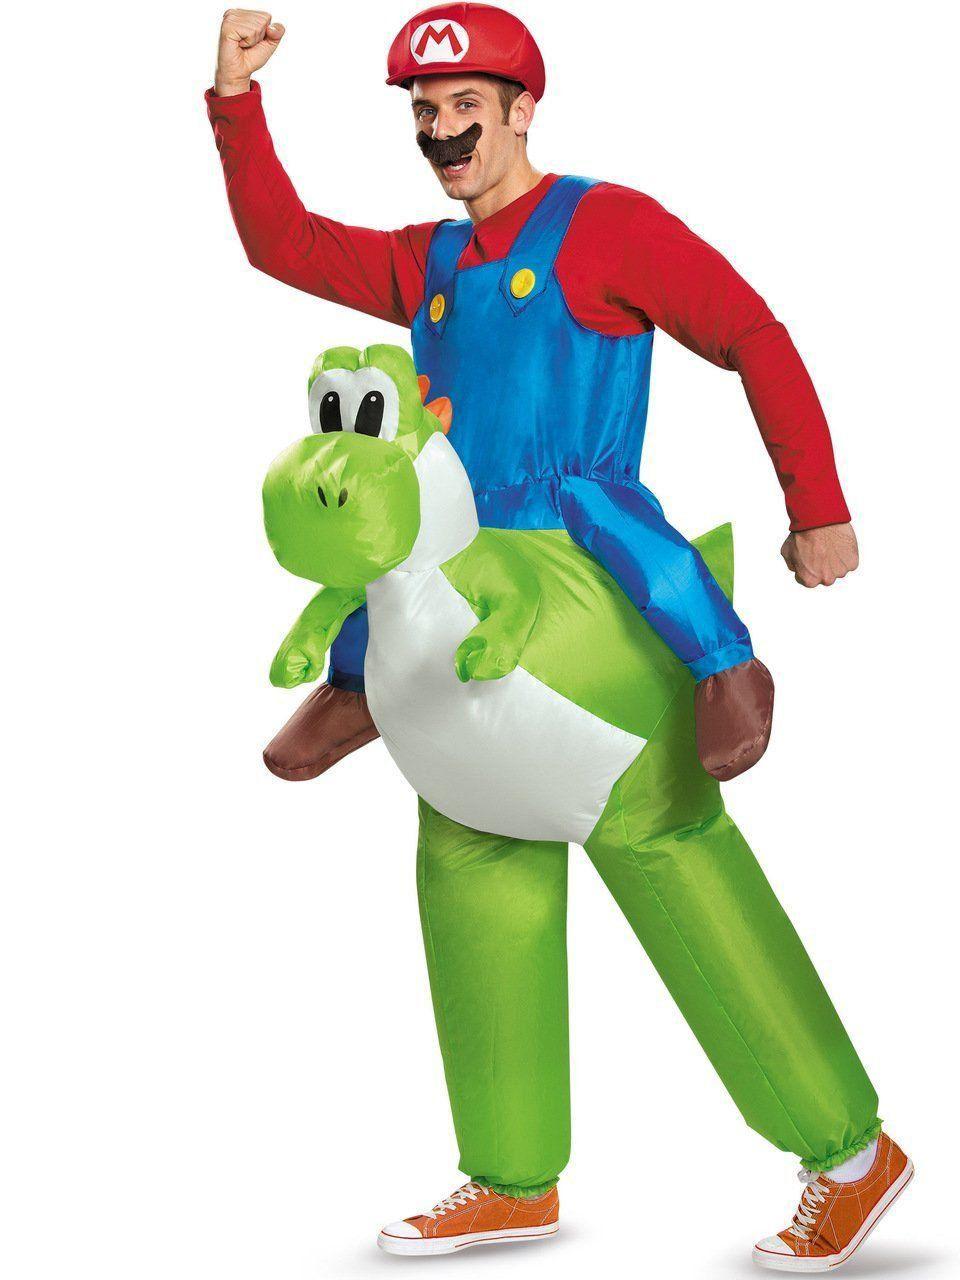 Fantasia Adulto Masculino: Super Mario Brothers no Yoshi (Apenas Venda Online)